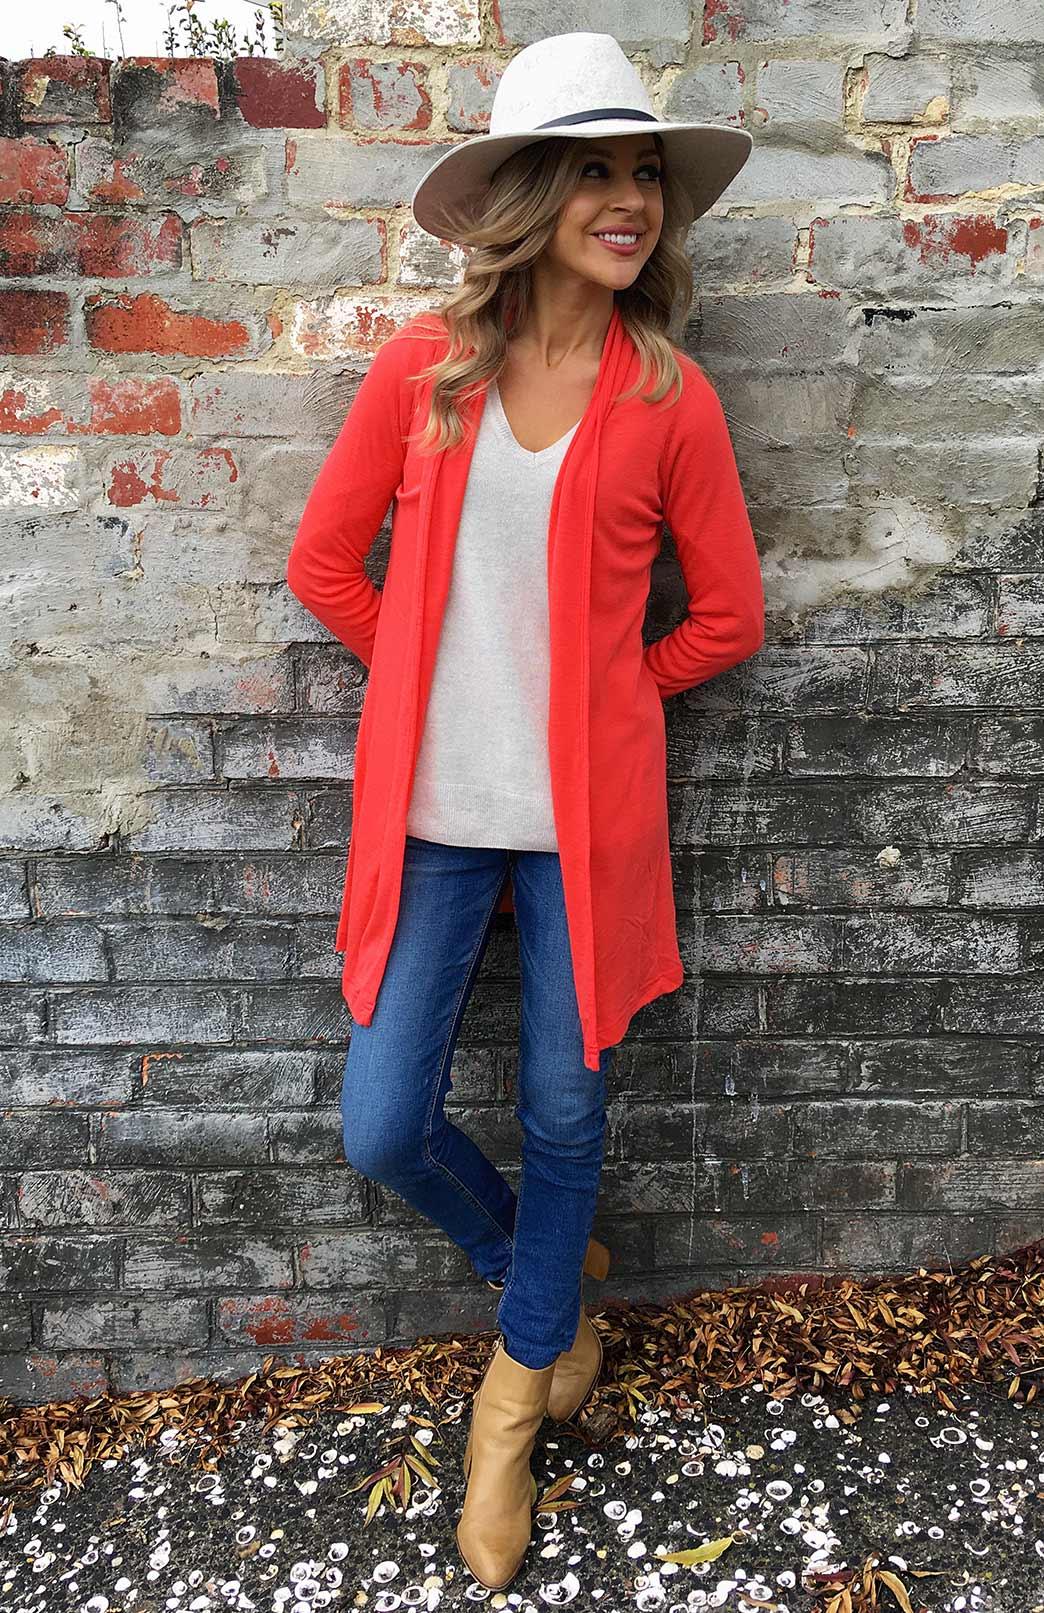 Drape Cardigan - Women's Pink Wool Drape Cardigan with no buttons or fastenings - Smitten Merino Tasmania Australia